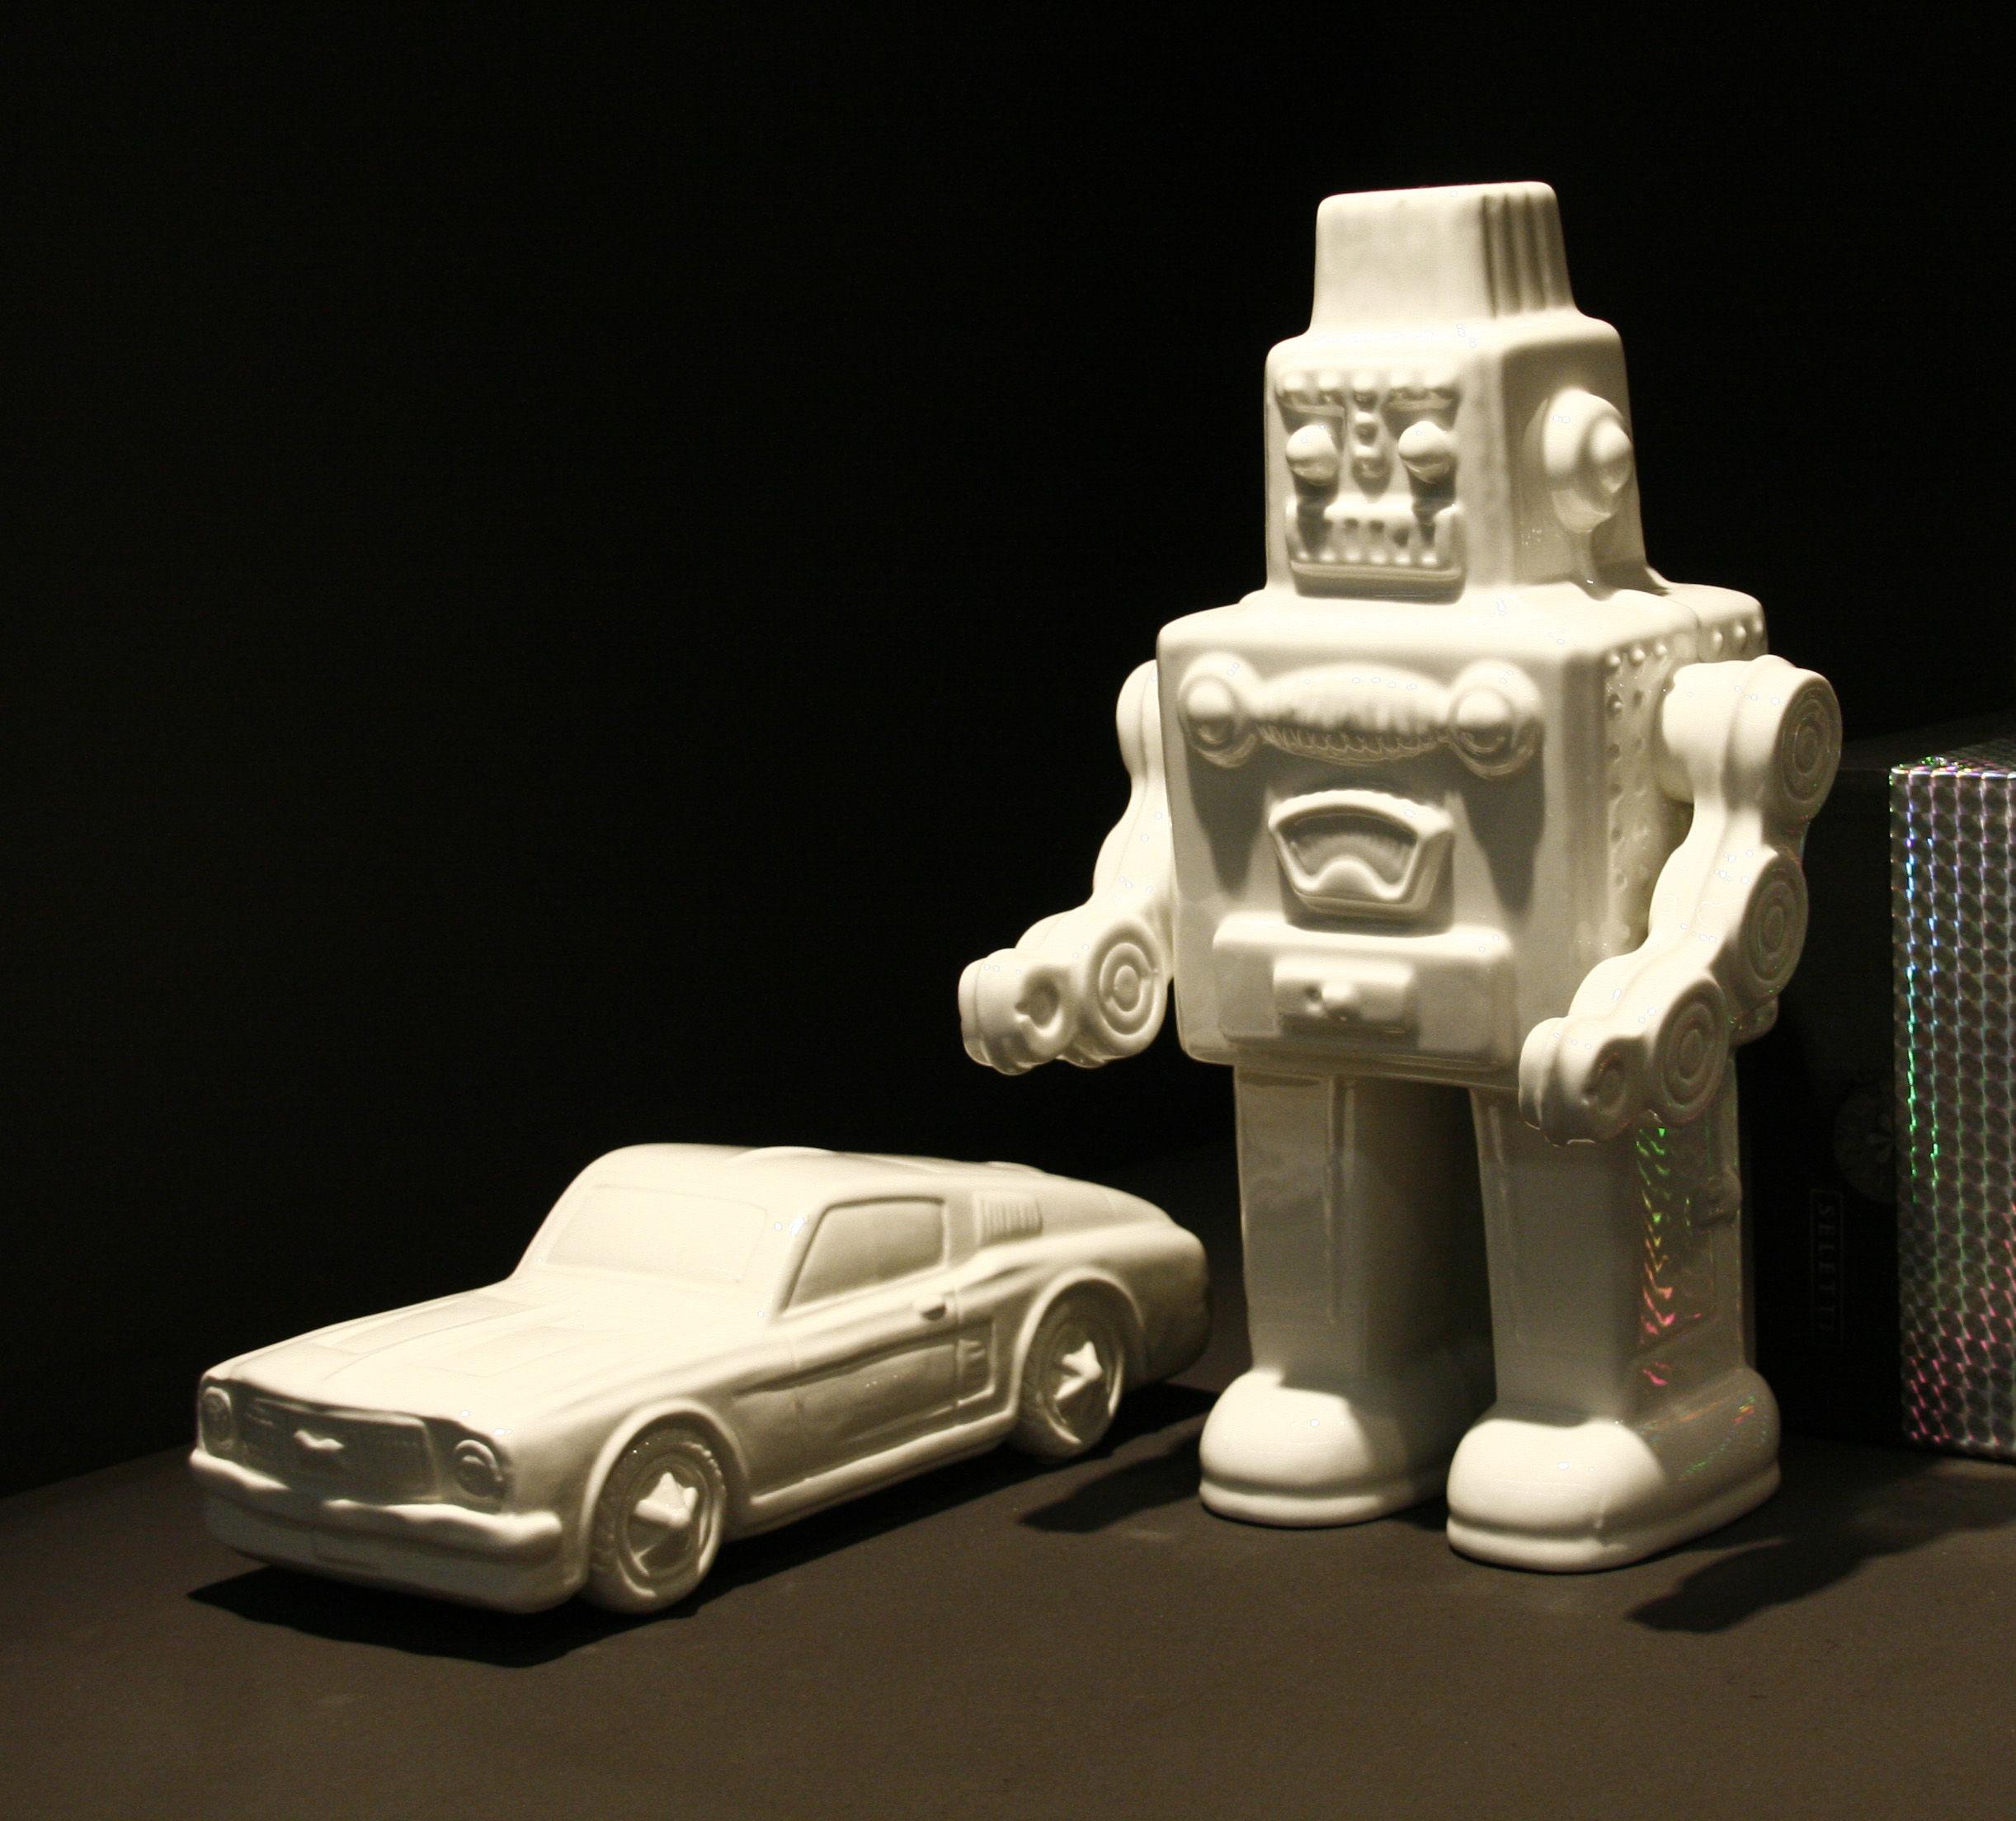 my robot Amazoncom: my robot (green light readers level 2) (9780152056179): eve bunting, dagmar fehlau: books.